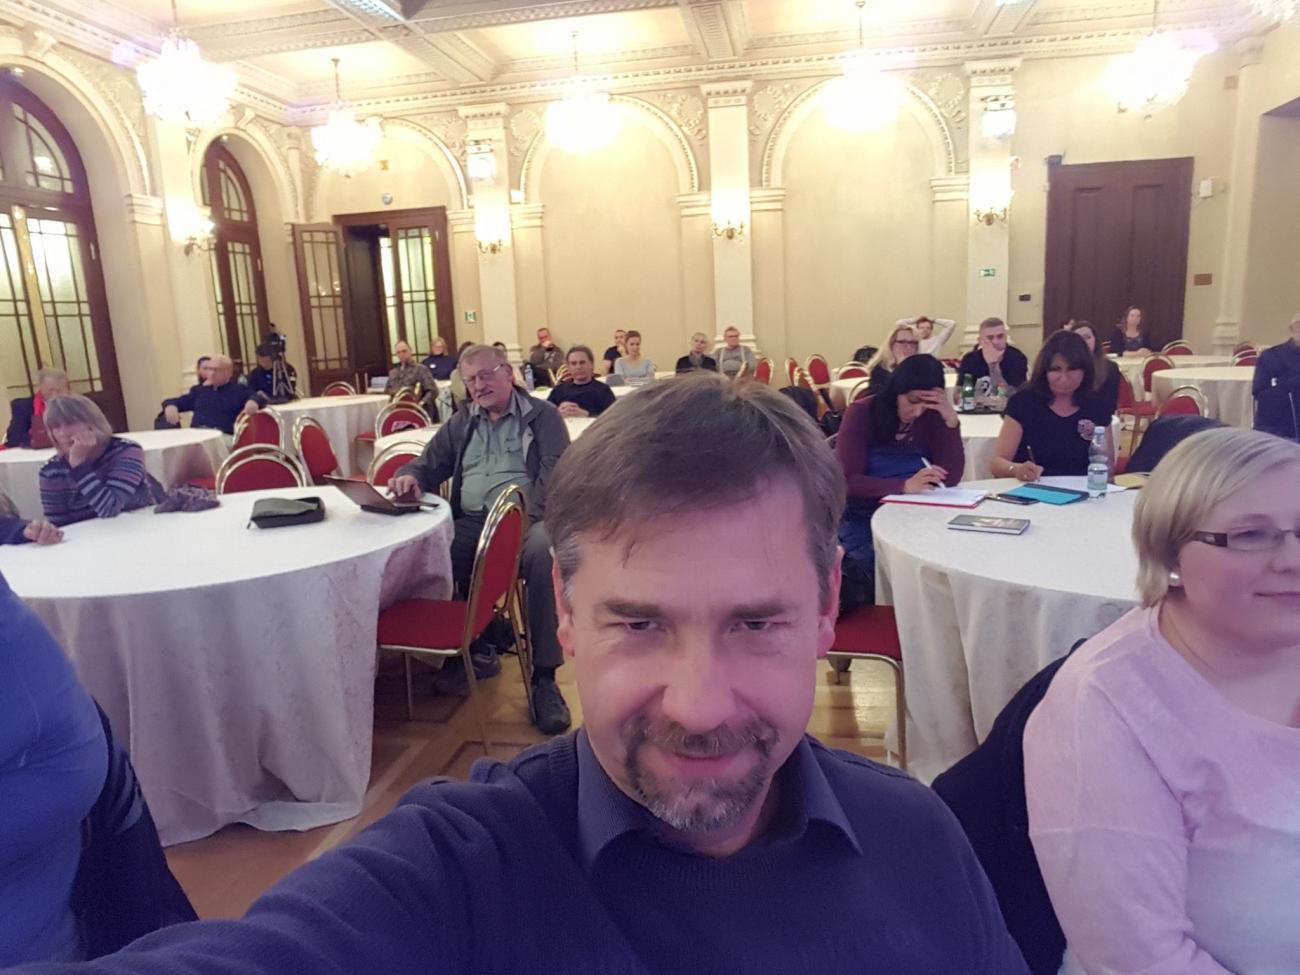 Pan Radek má rád creepy výrazy a Putina, naopak nesnáší USA a ilumináty. A taky šéfuje Bezpečnostnímu výboru.